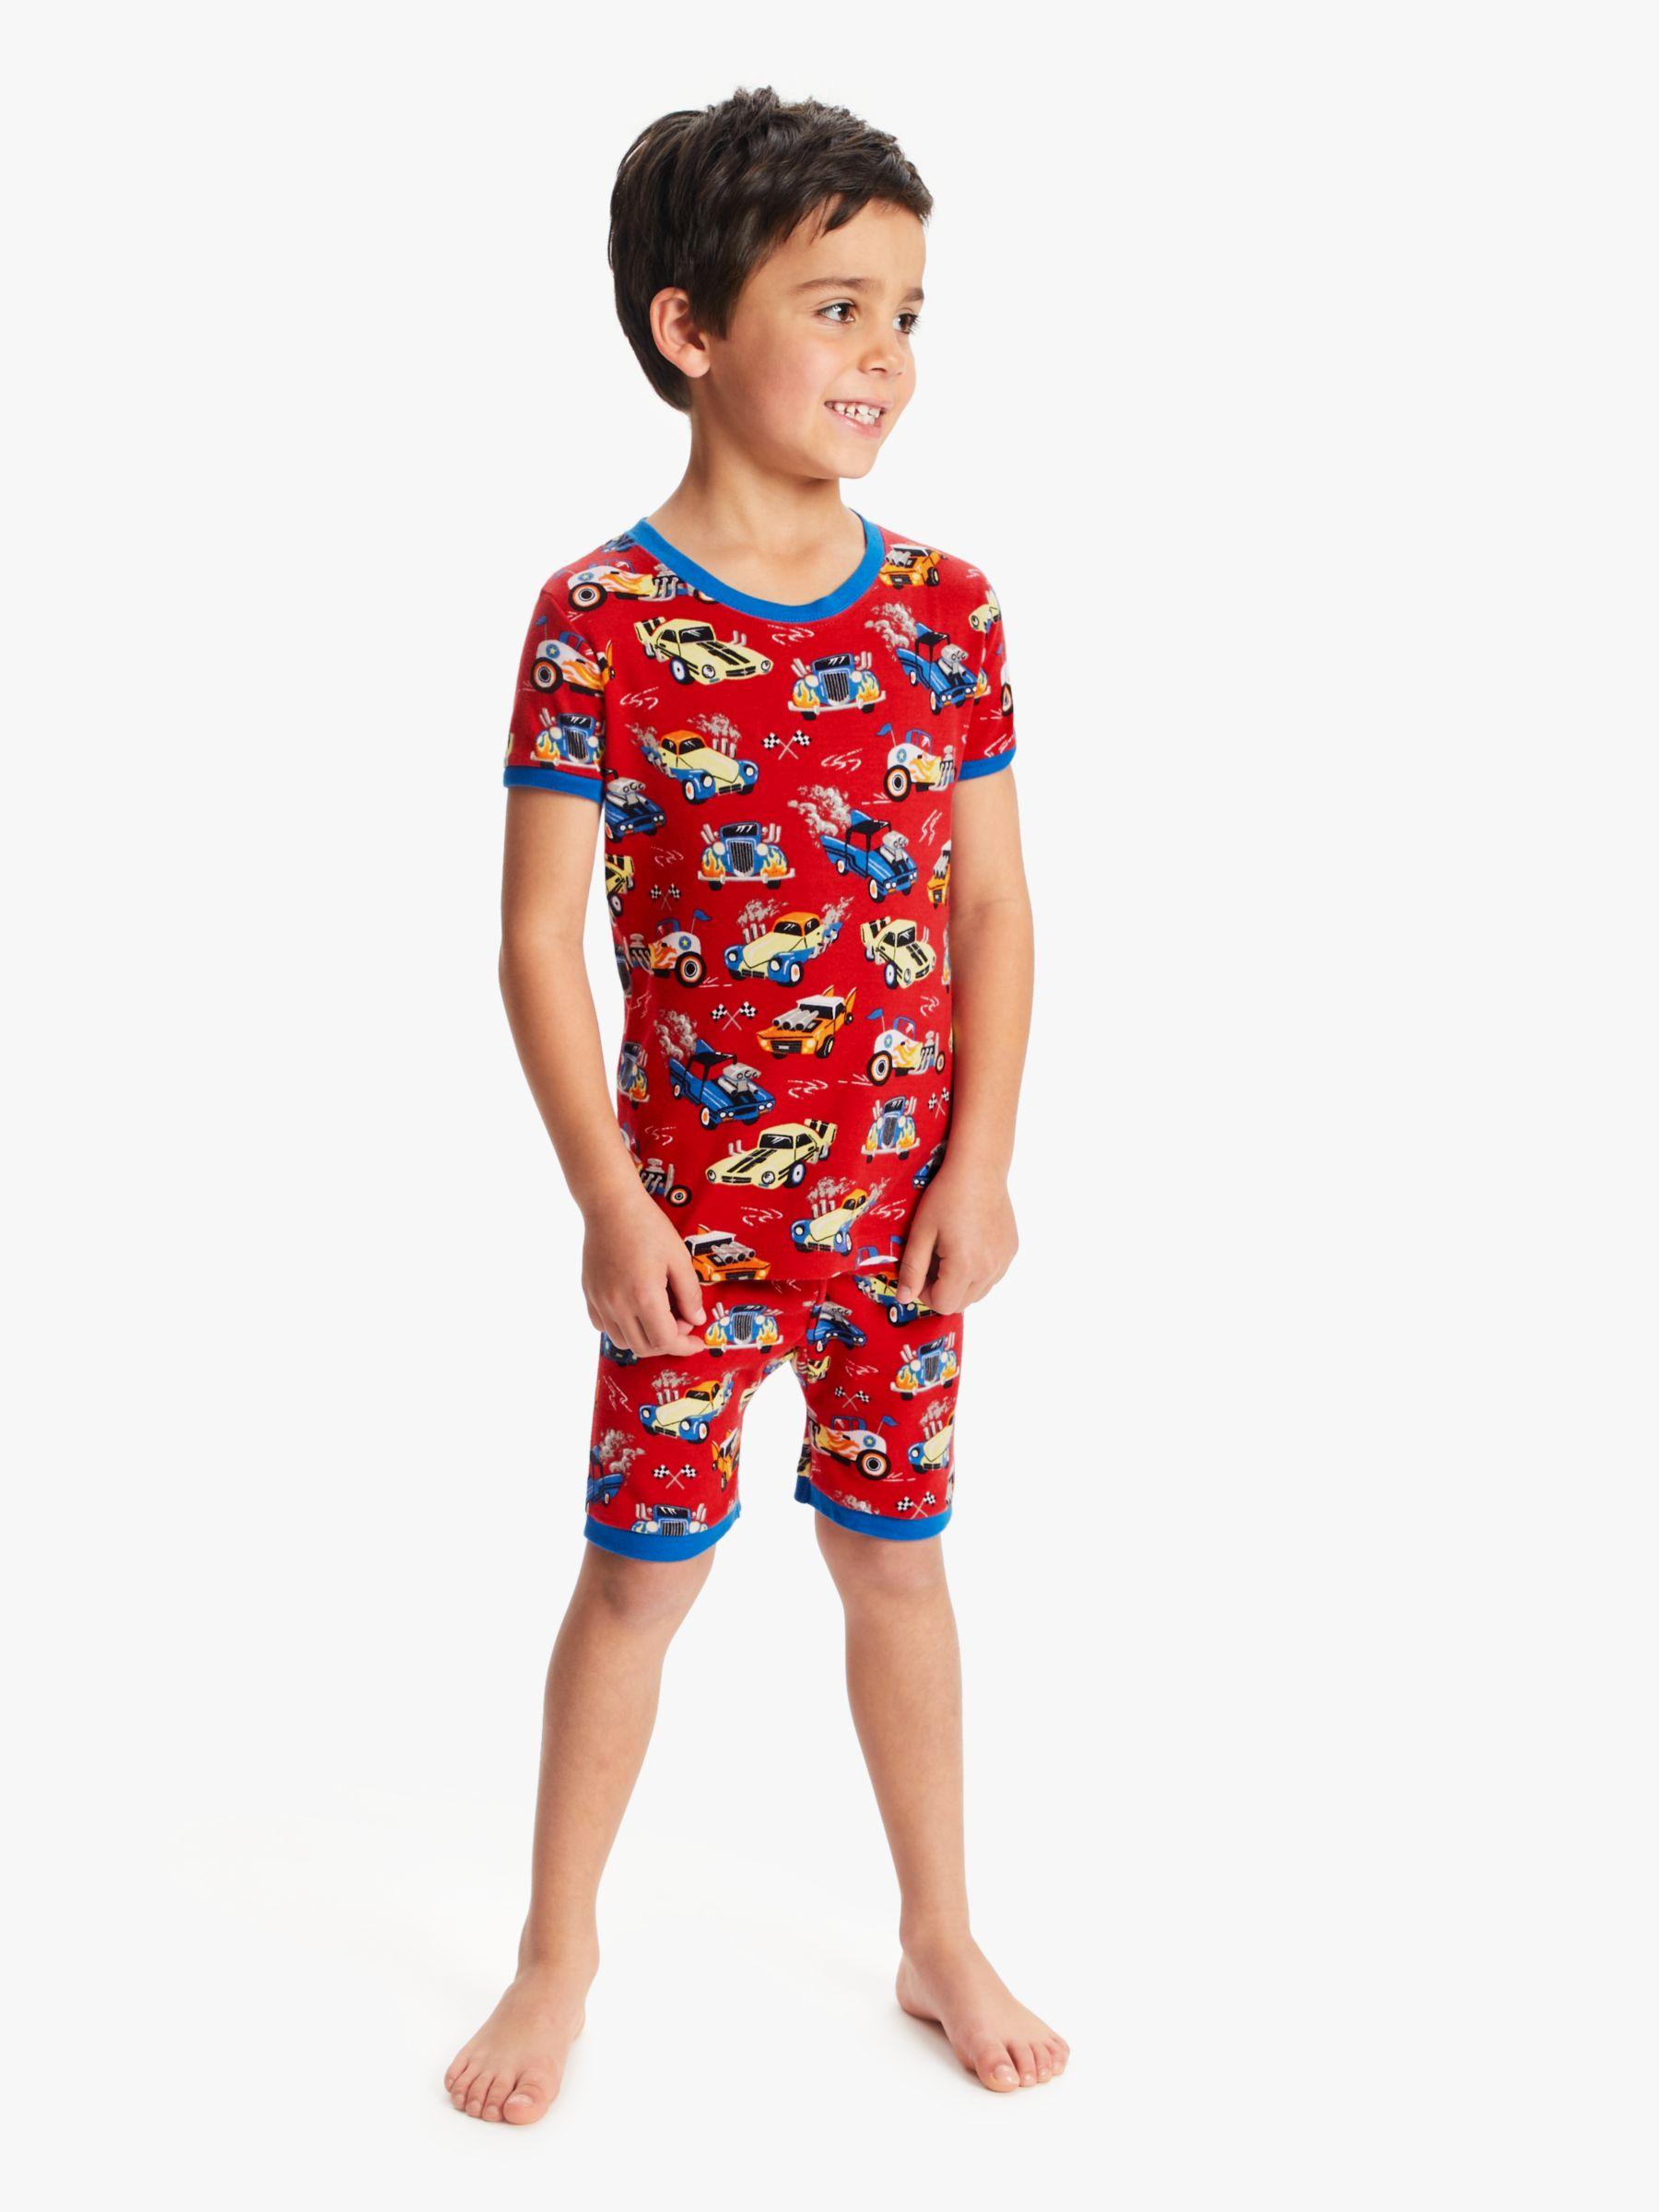 Hatley Hatley Boys' Car Print Short Pyjamas, Red